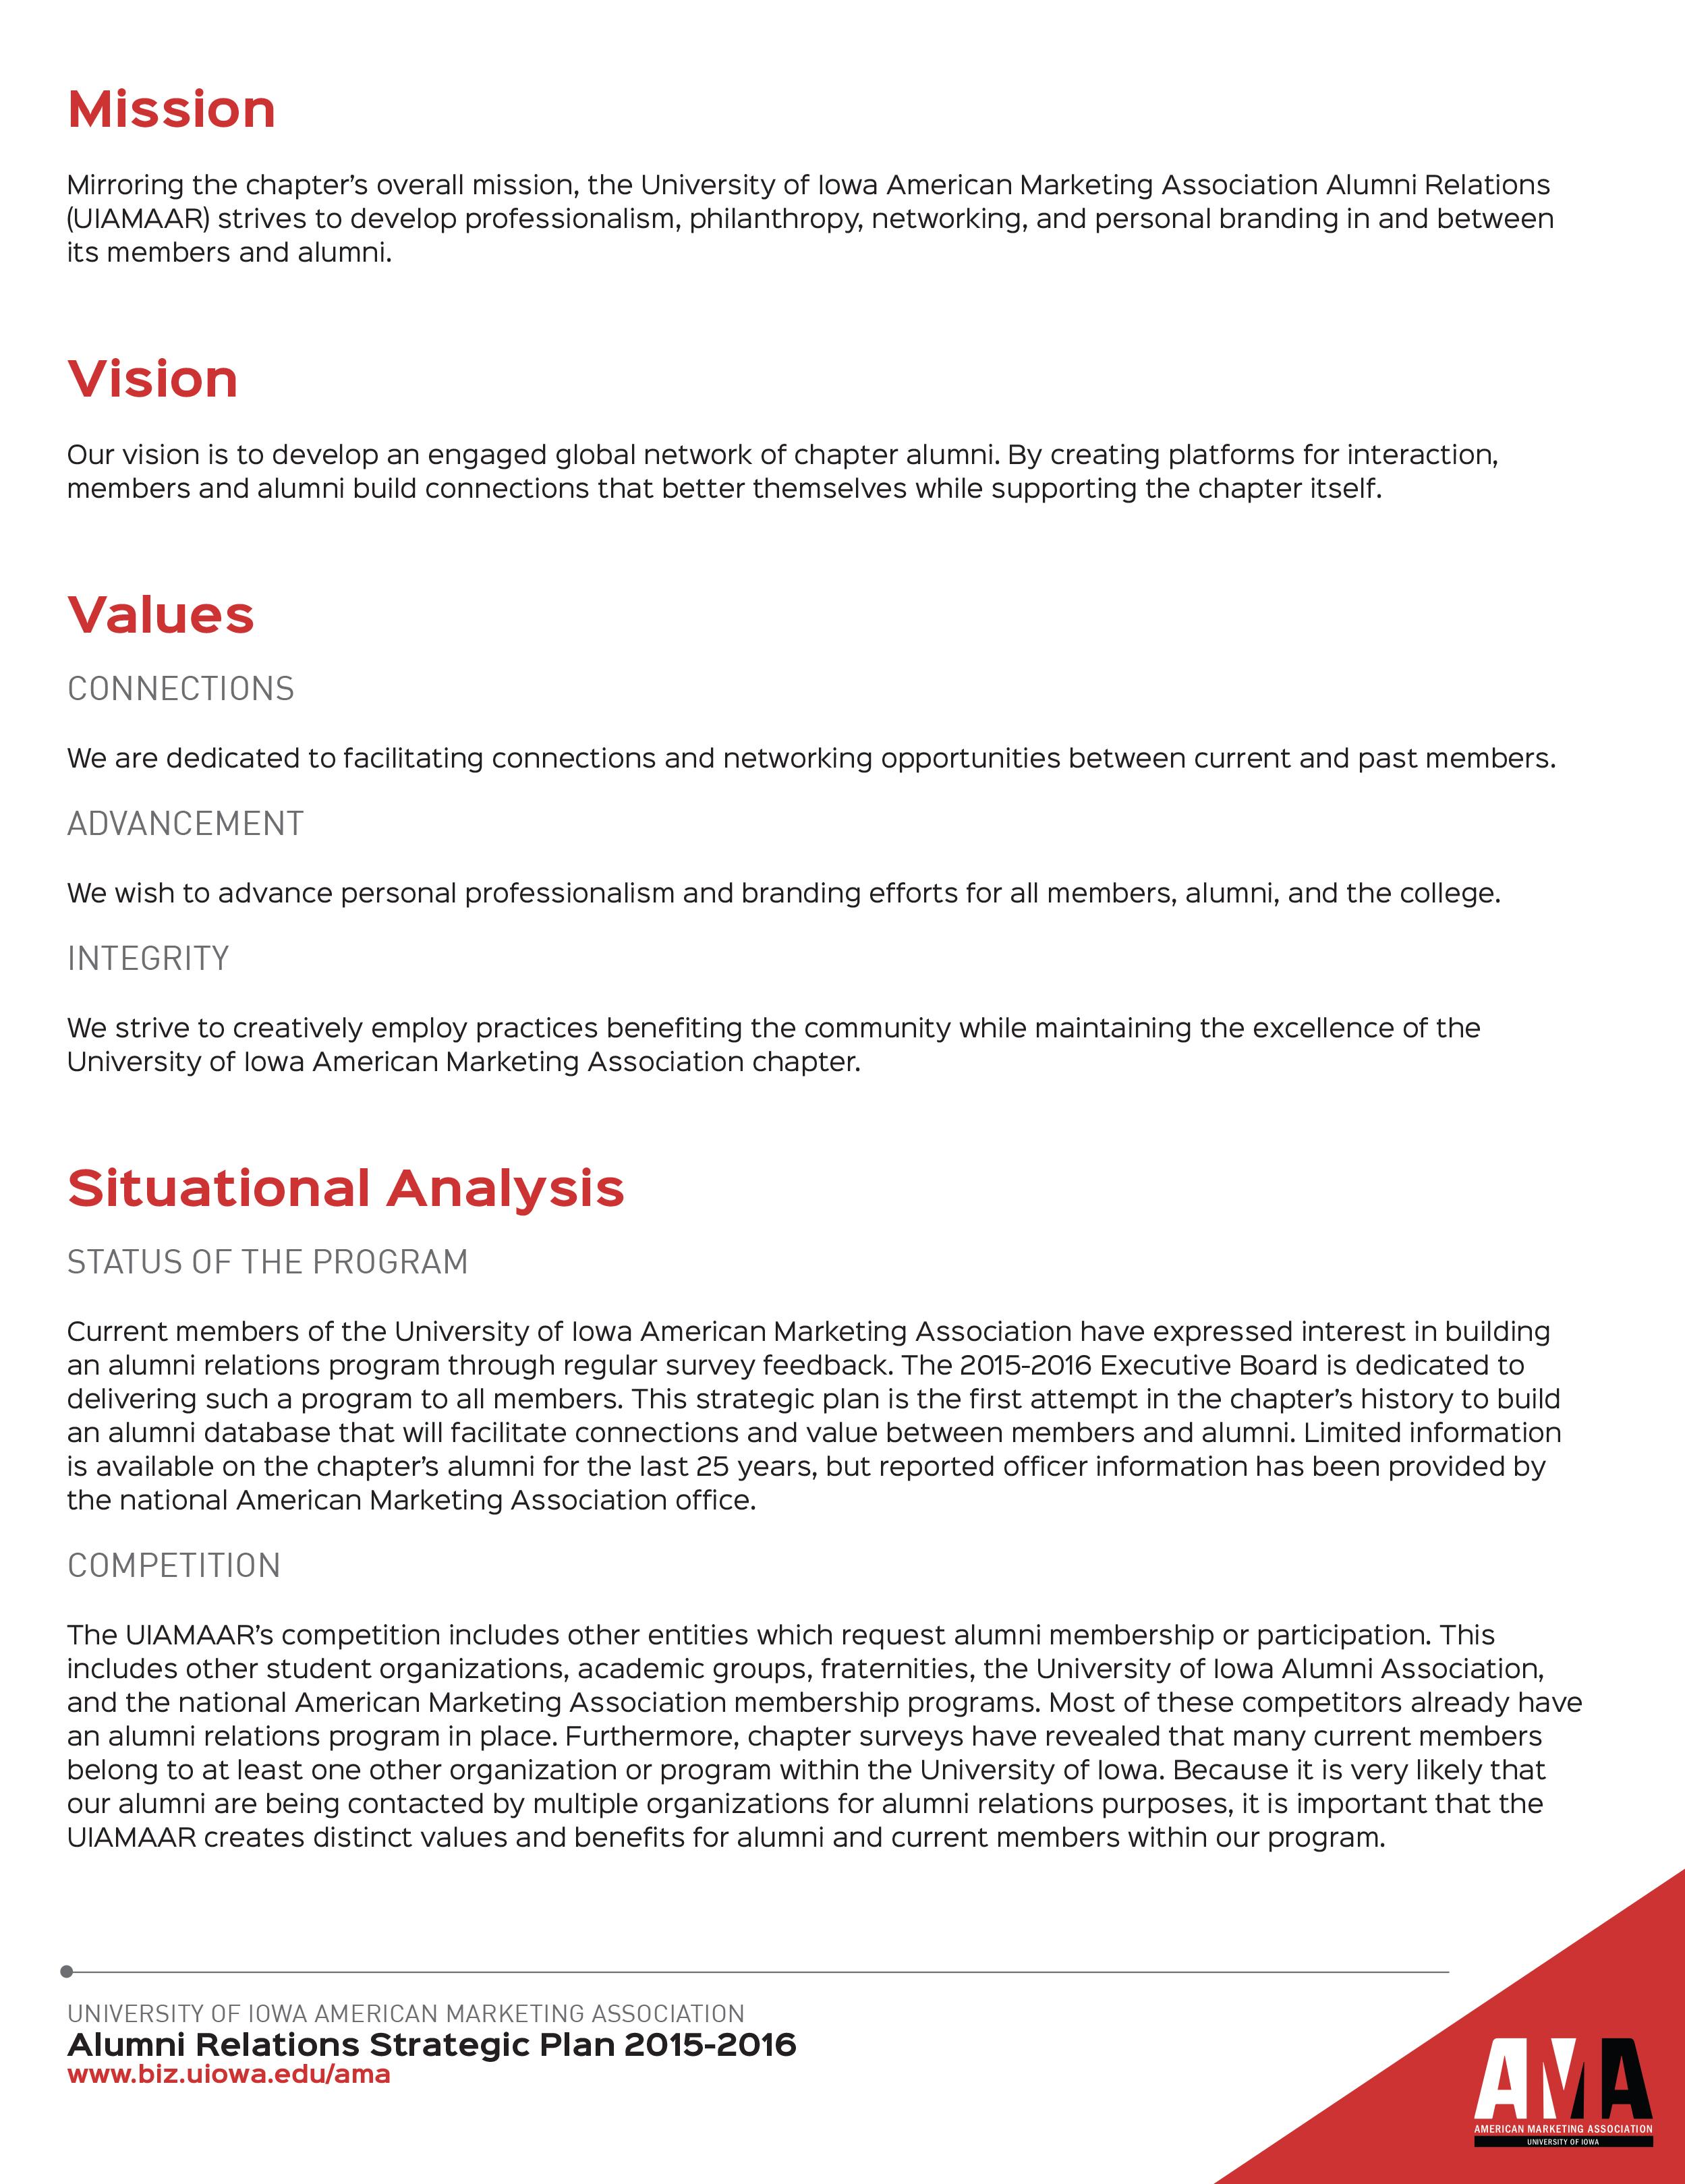 ama_alumnistrategicplan-2.jpg